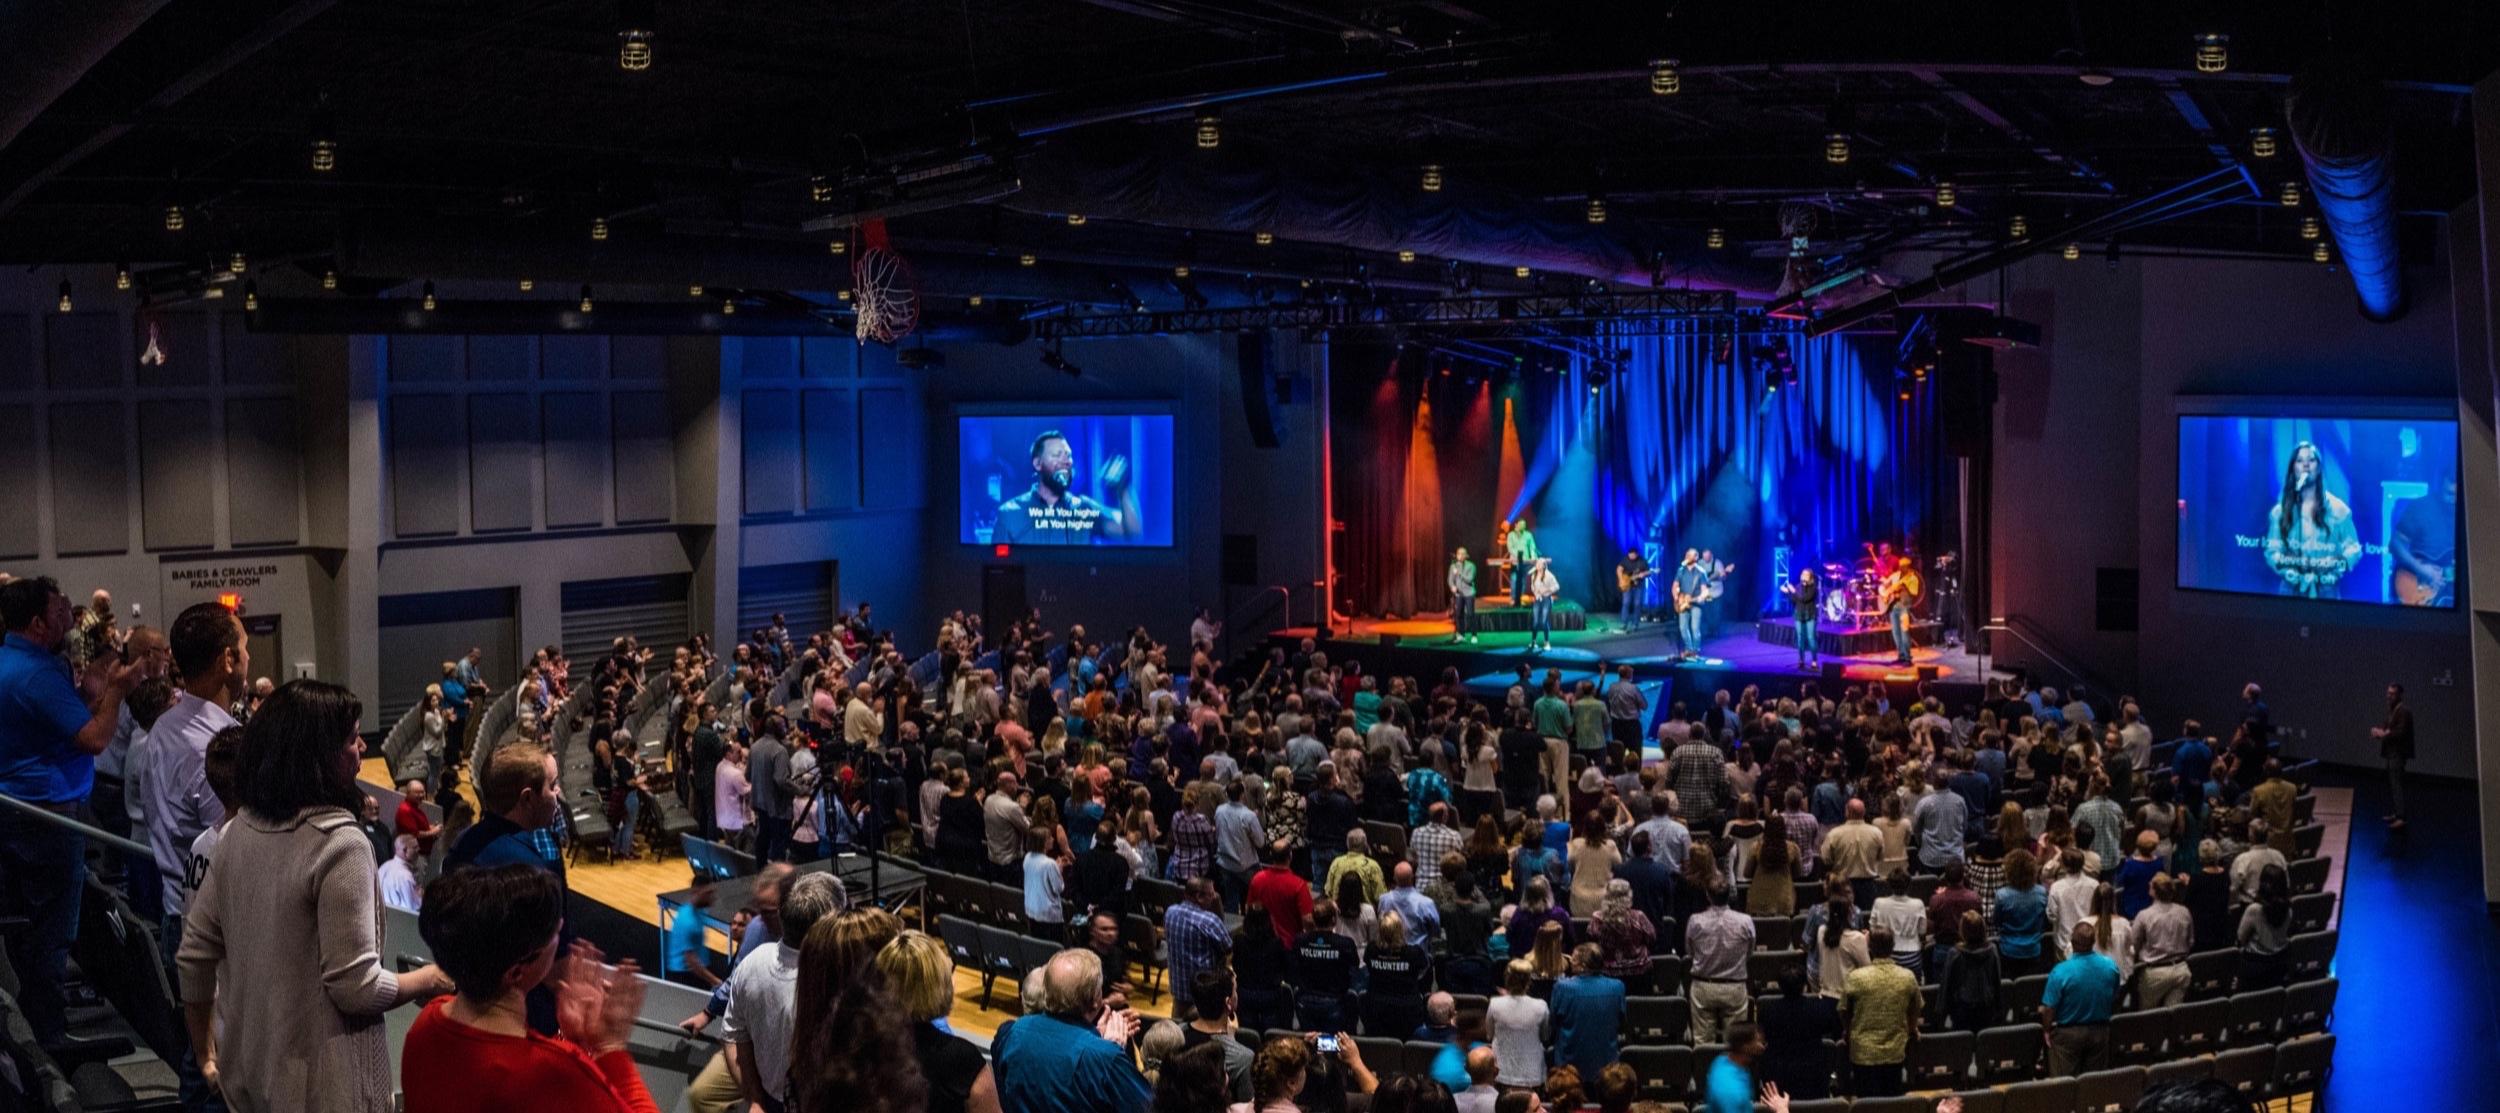 Fishhawk fellowship church: - Building relationships, building fellowship.